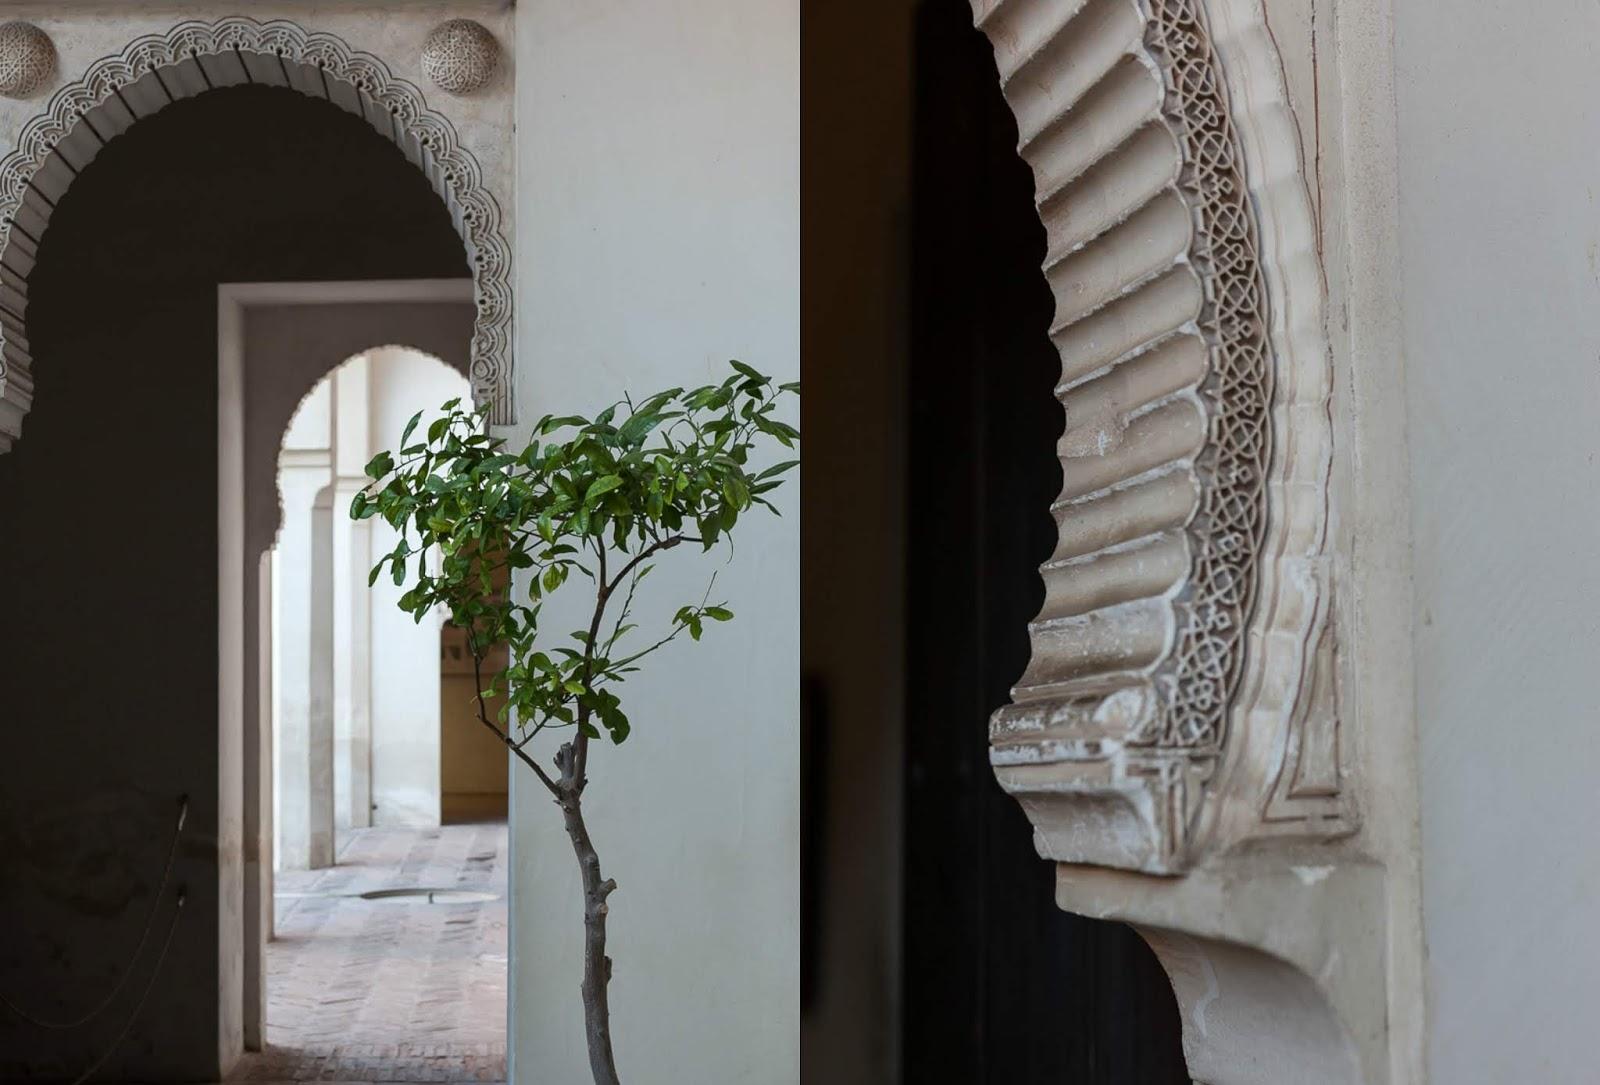 Malaga photo tour in the morning light